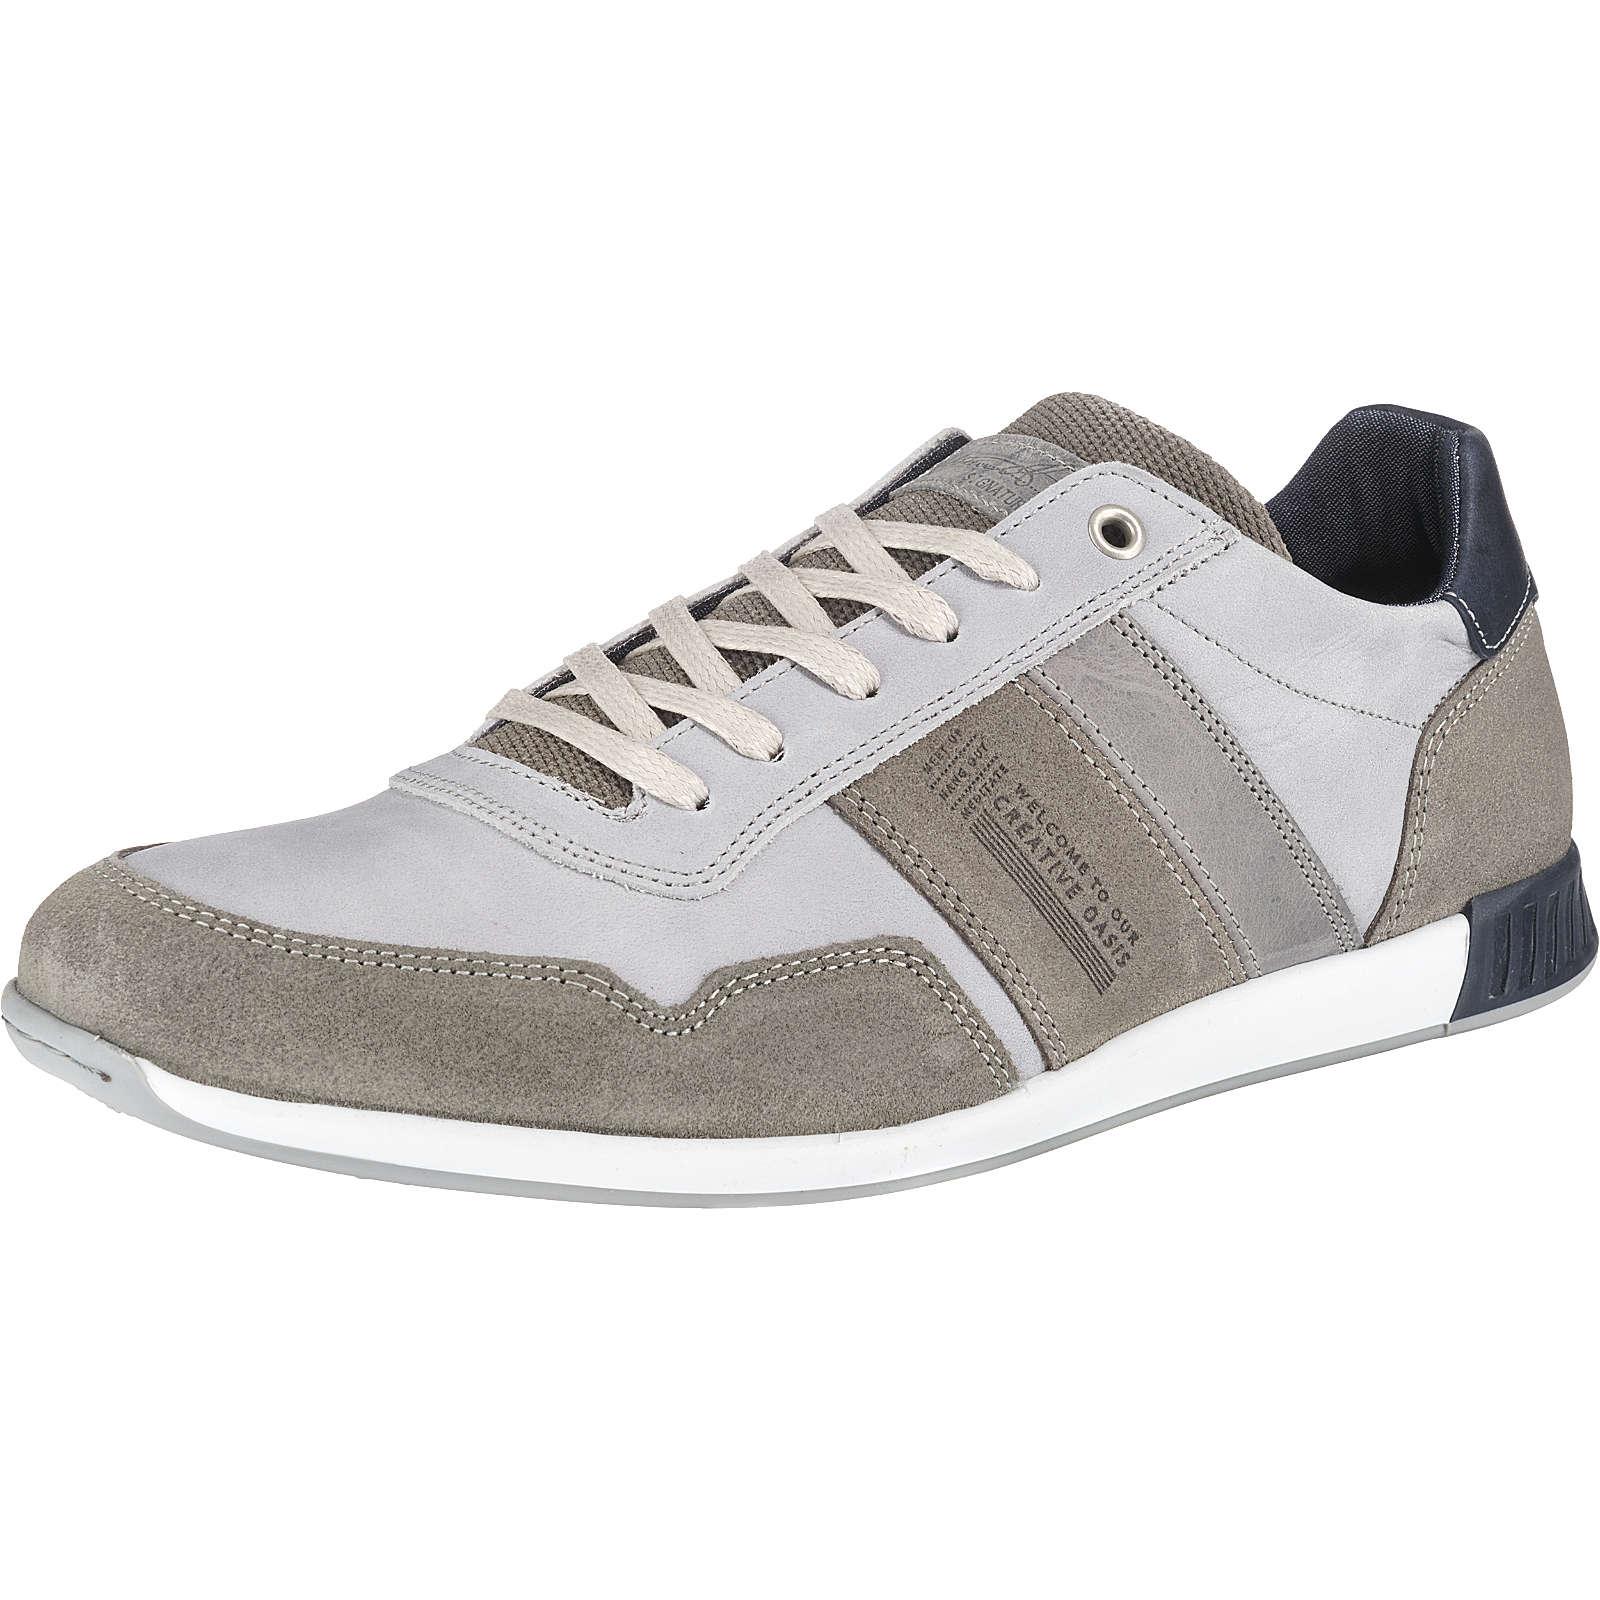 BULLBOXER Sneakers Low grau Herren Gr. 43